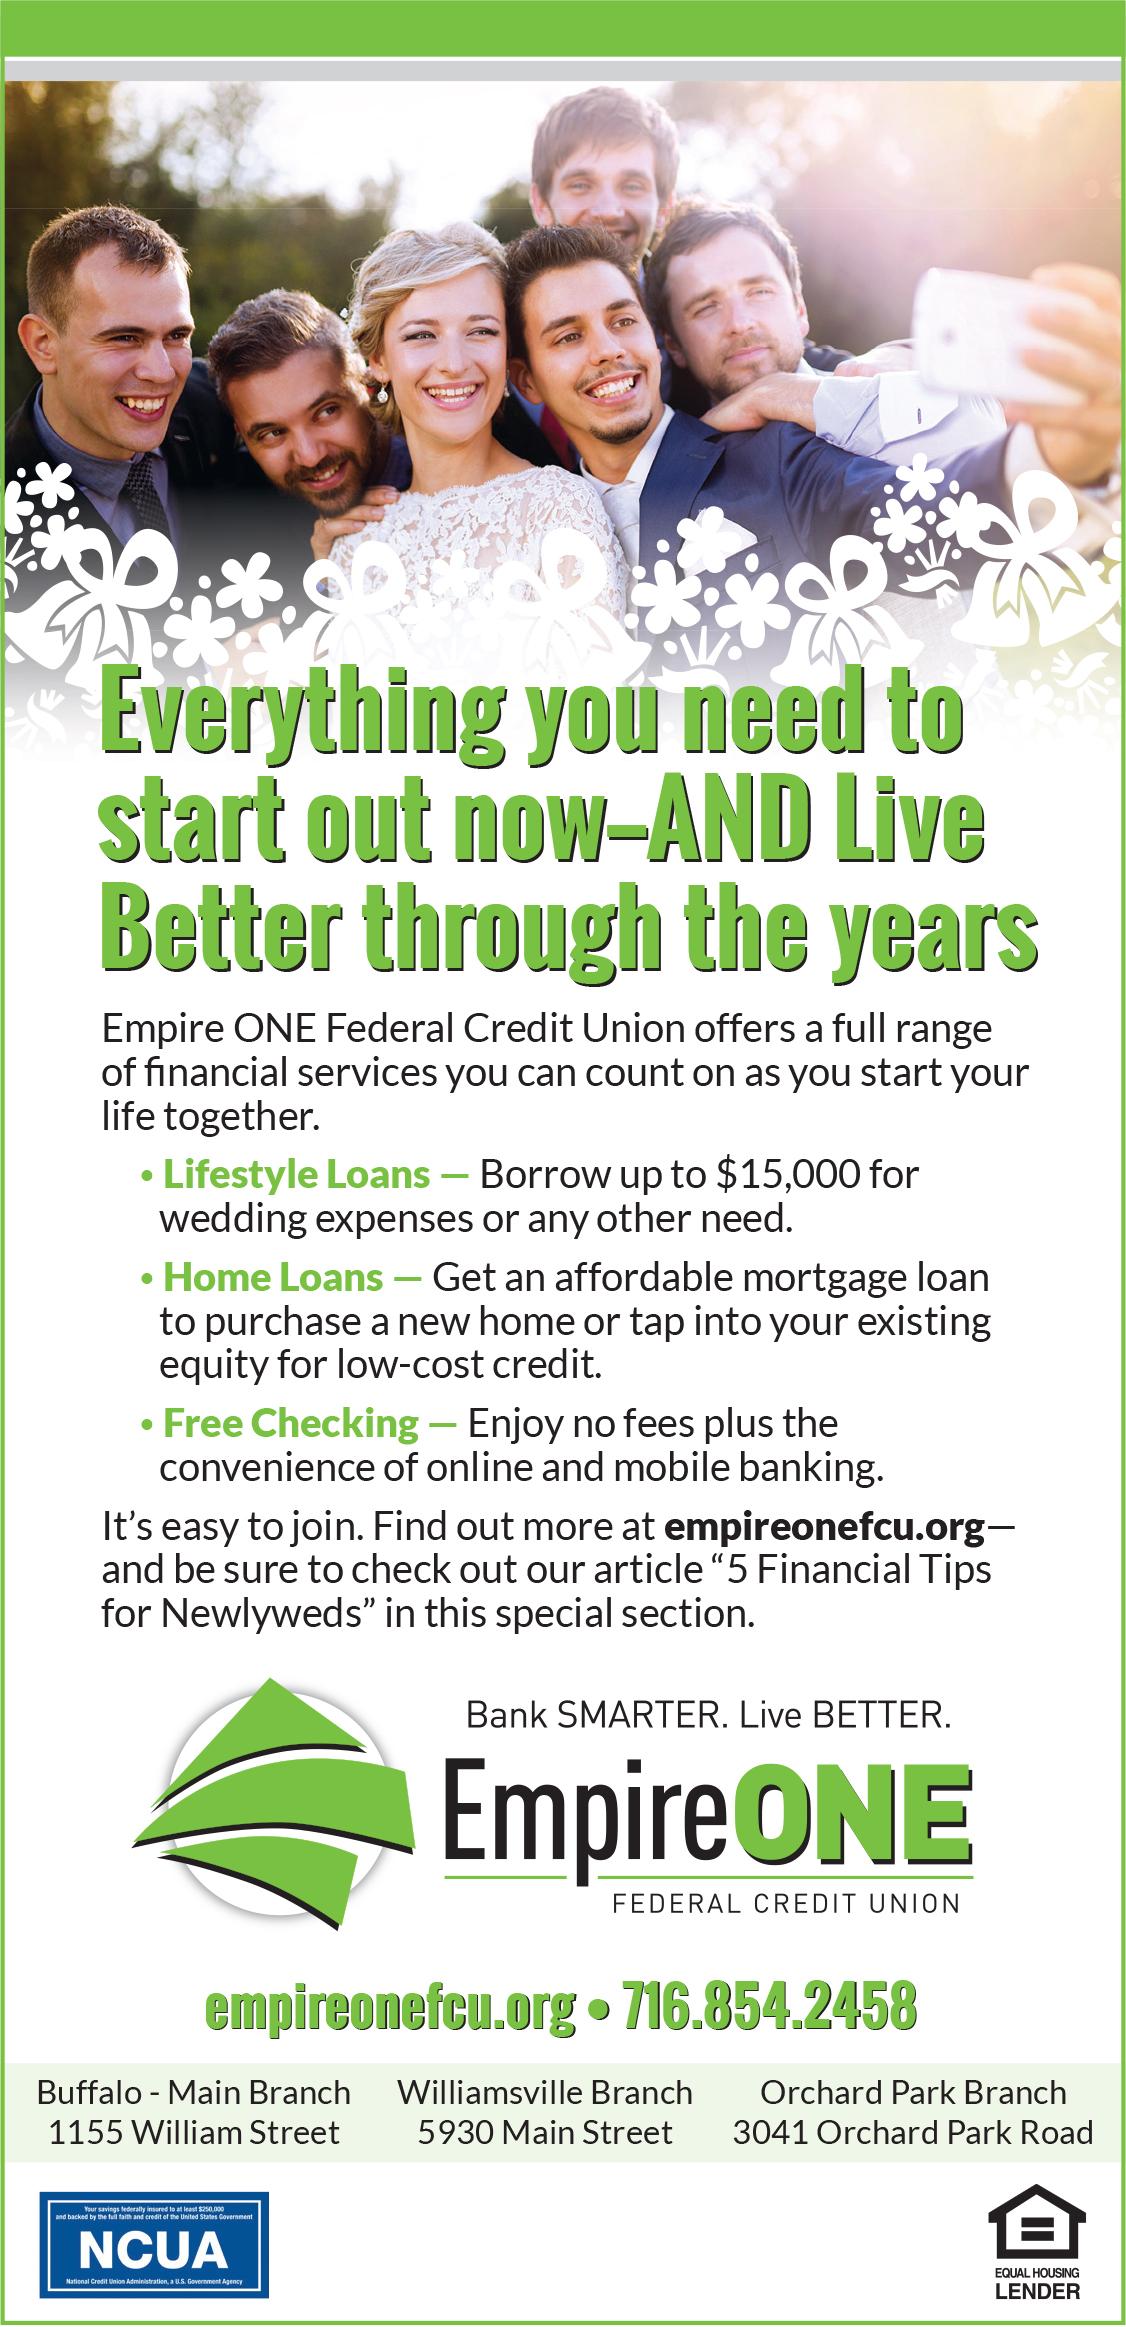 Empire_ONE_Wedding_Lifestyle_Loans